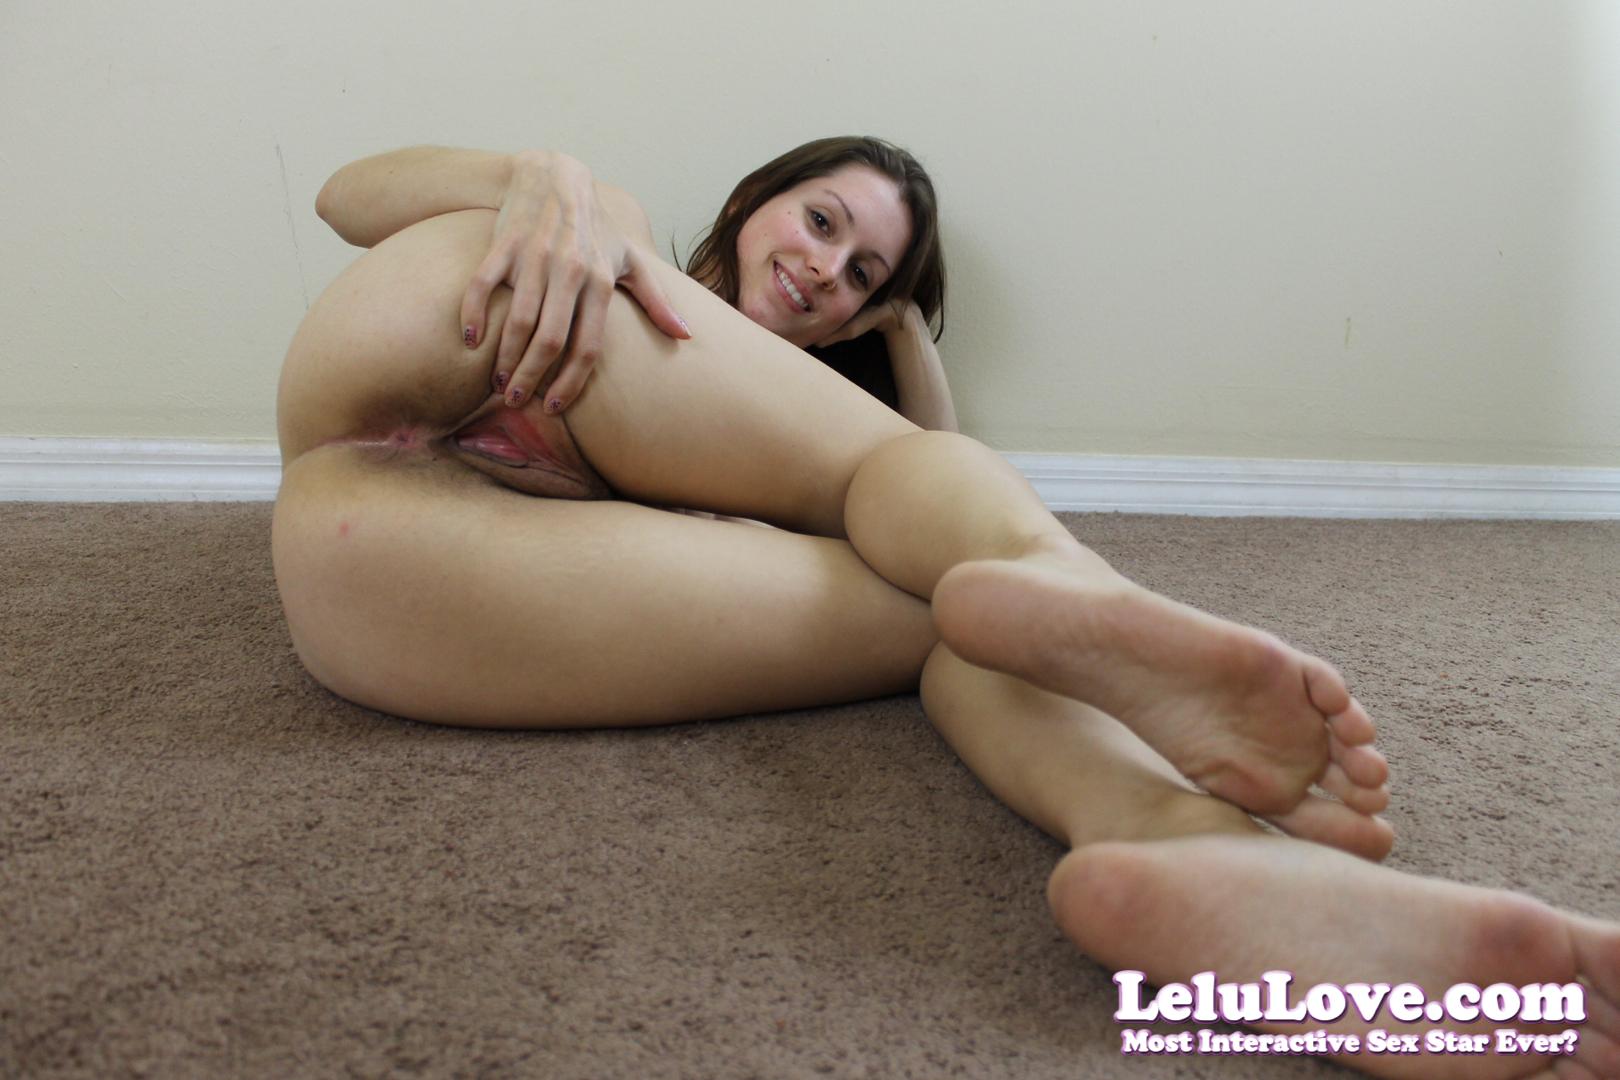 lelu love porn